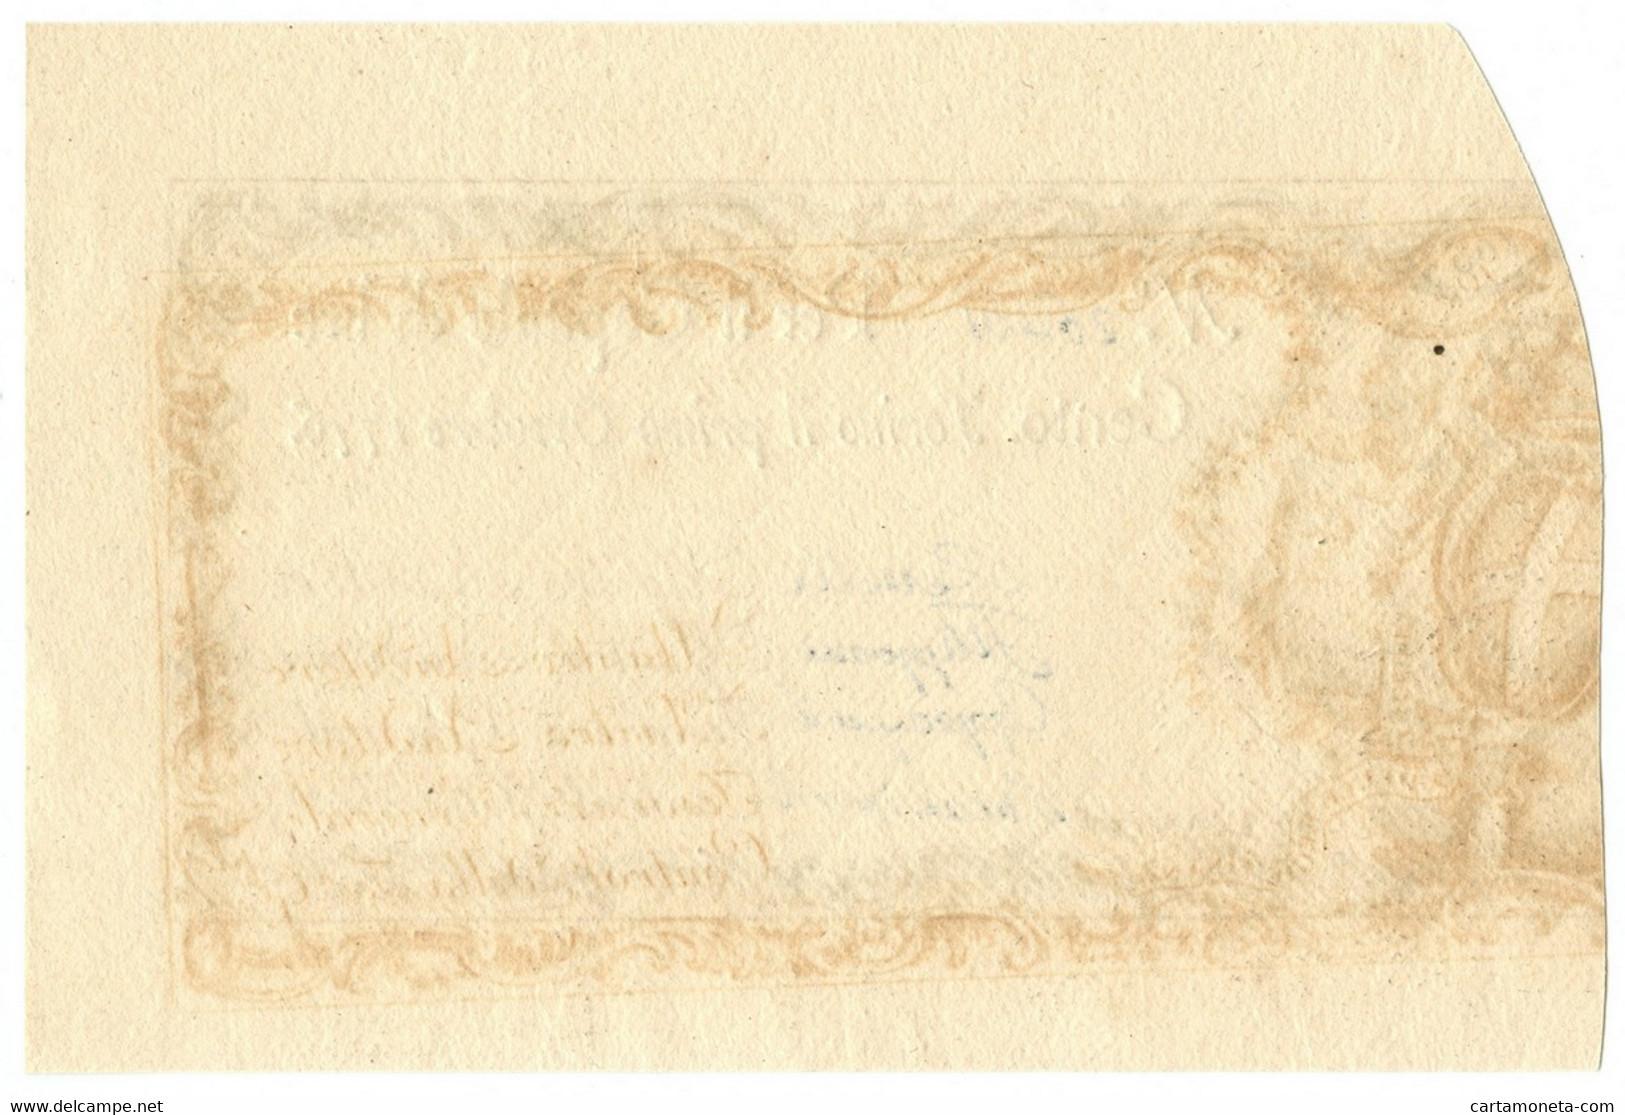 100 LIRE REGIE FINANZE TORINO REGNO DI SARDEGNA 01/10/1776 QFDS - Altri